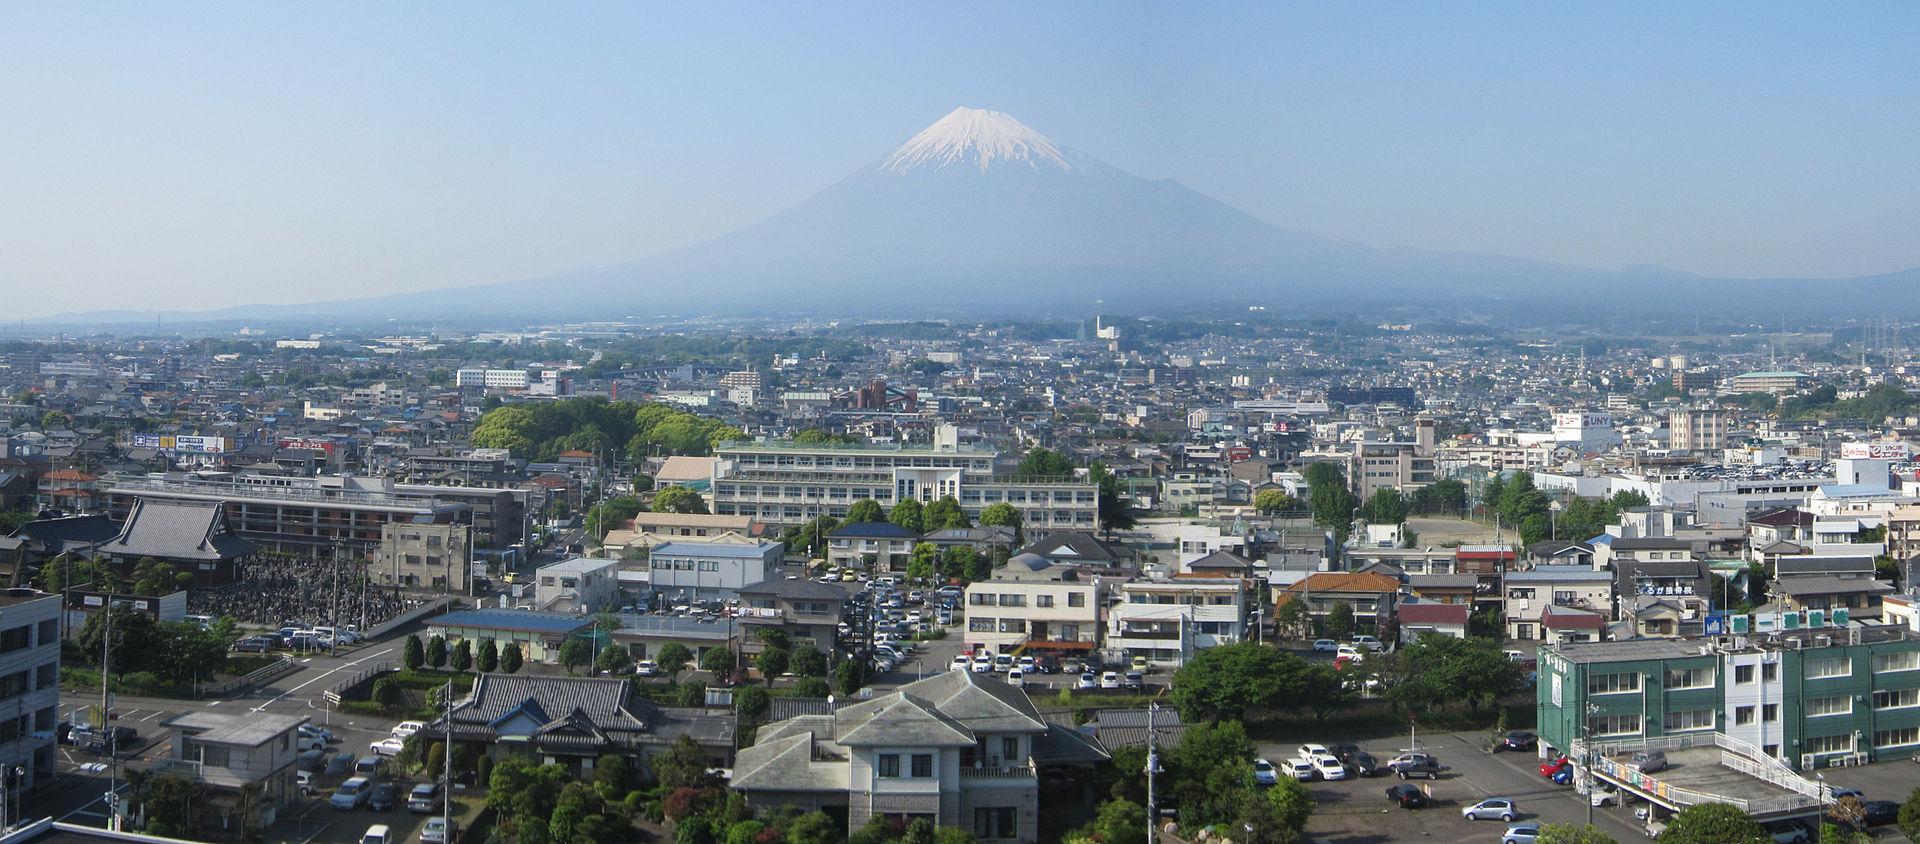 Fuji Shizuoka Wikipedia